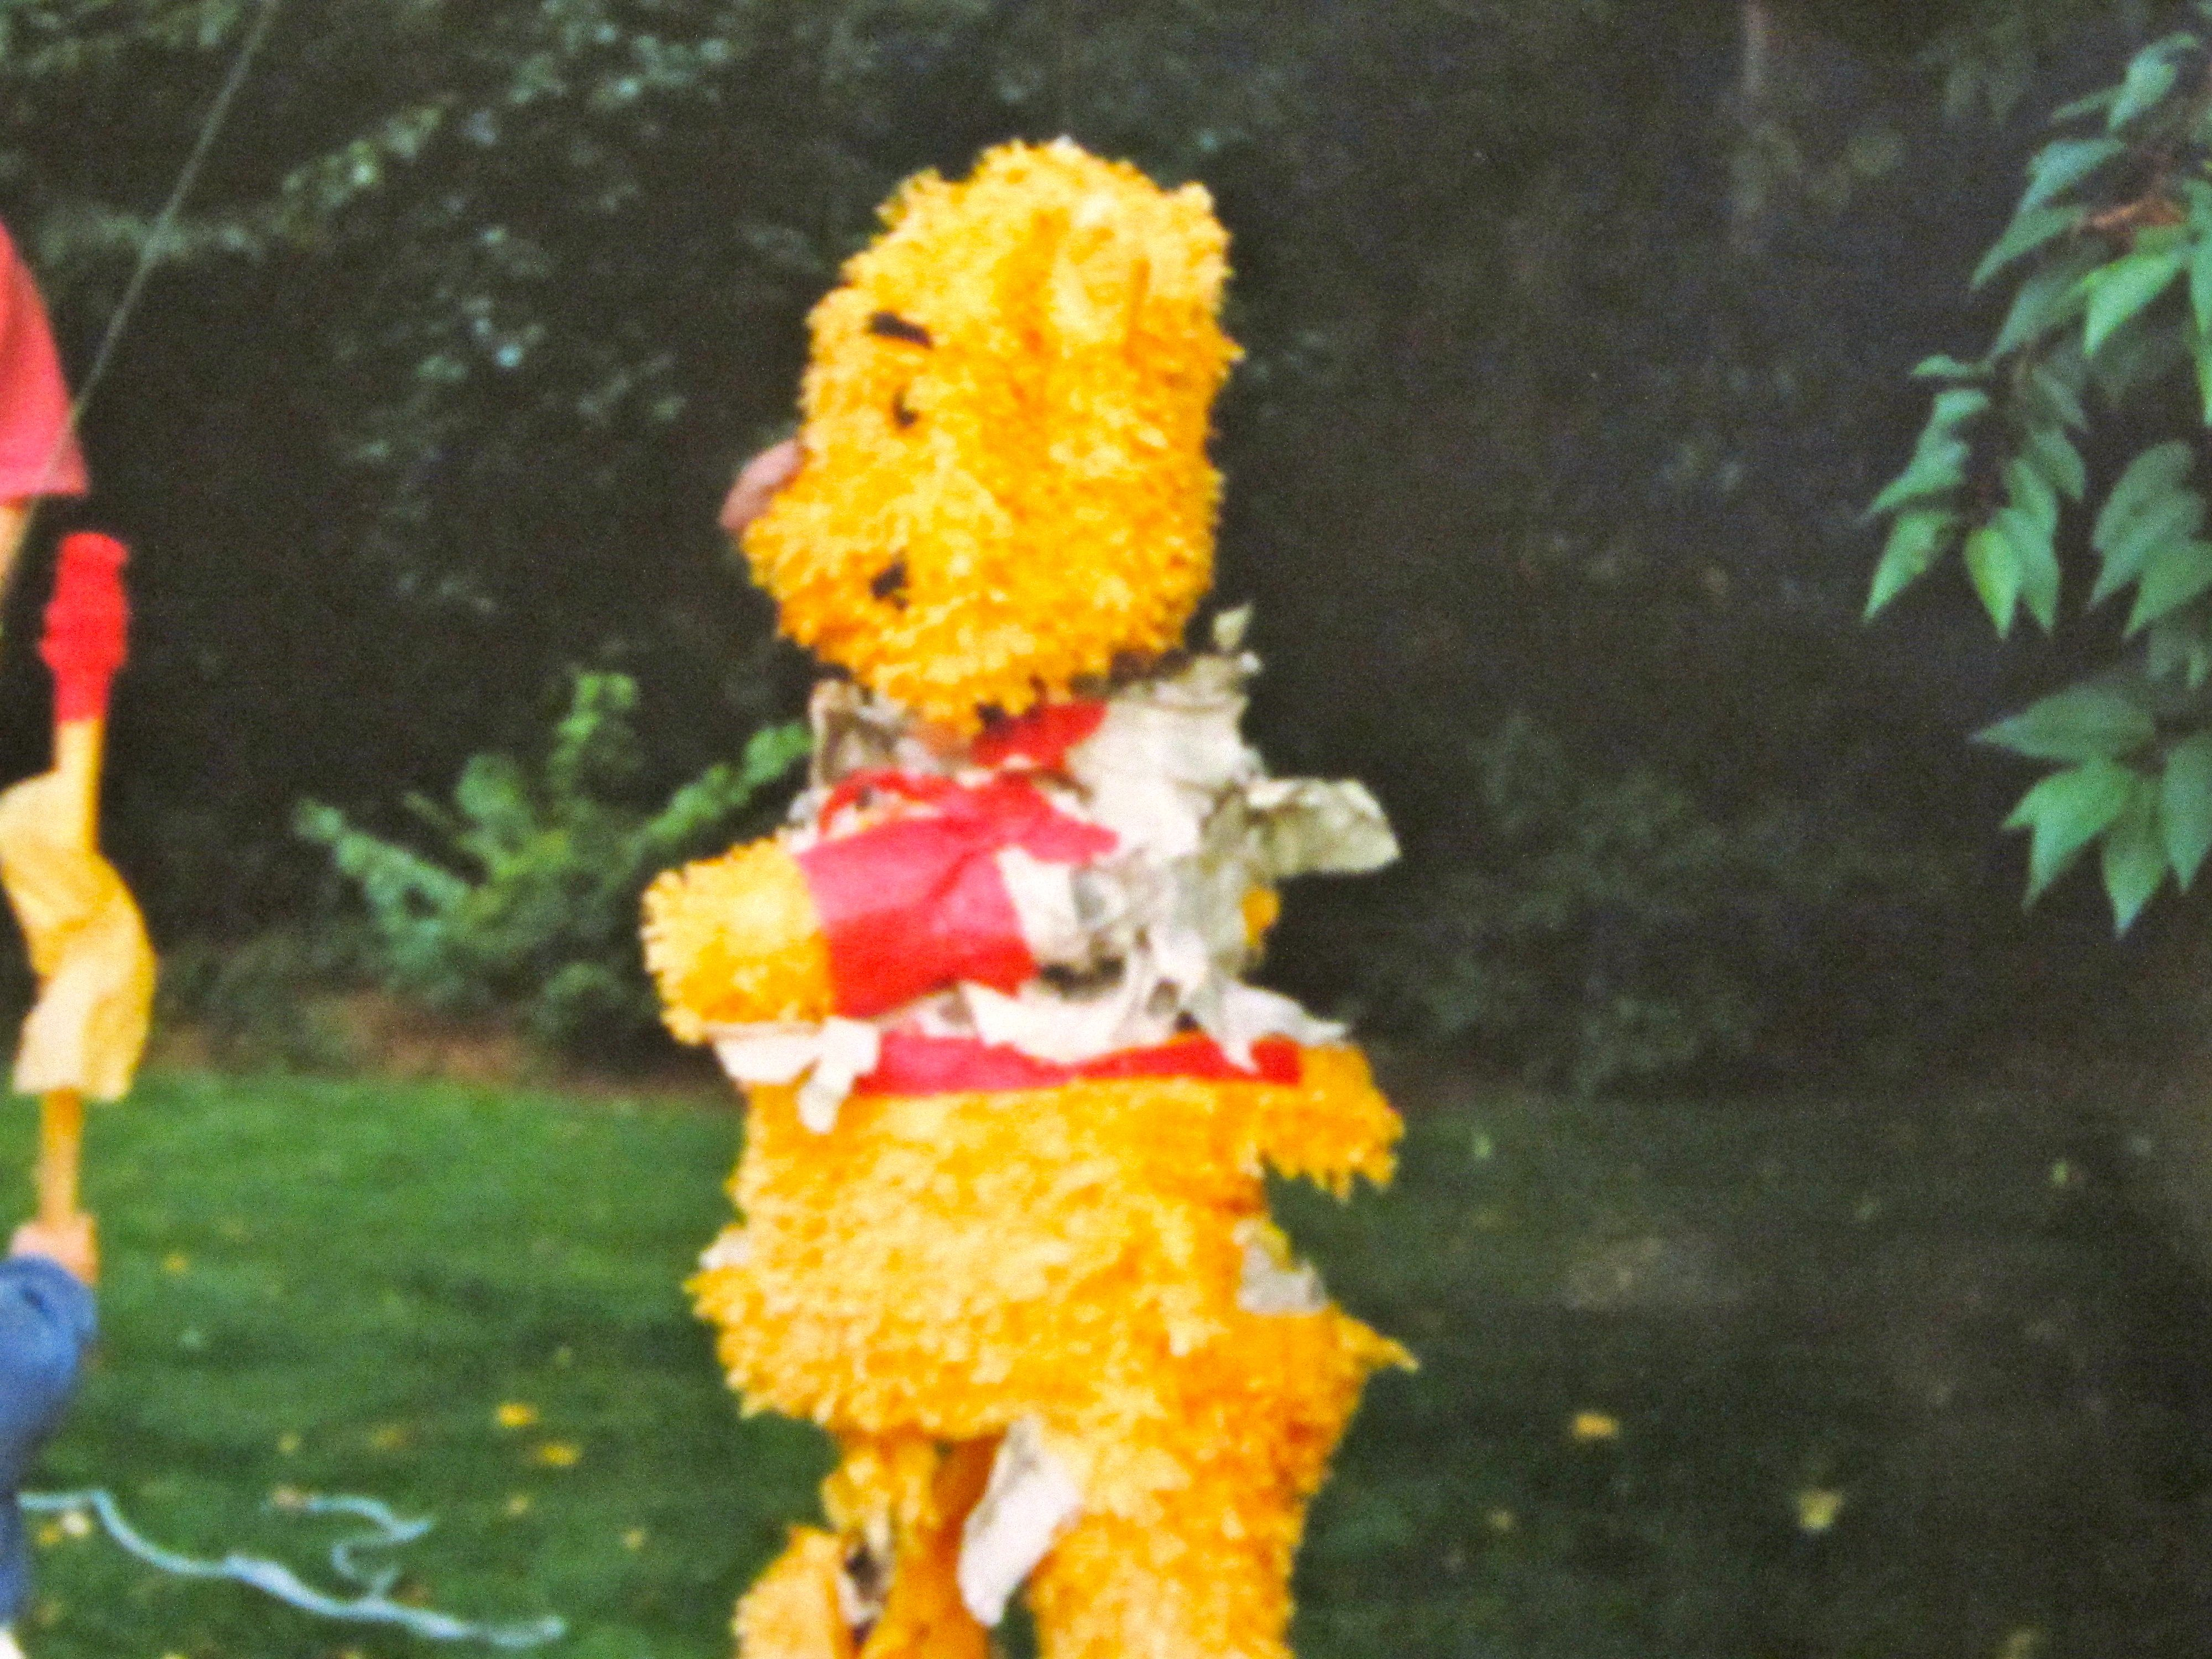 image for hitting a piñata